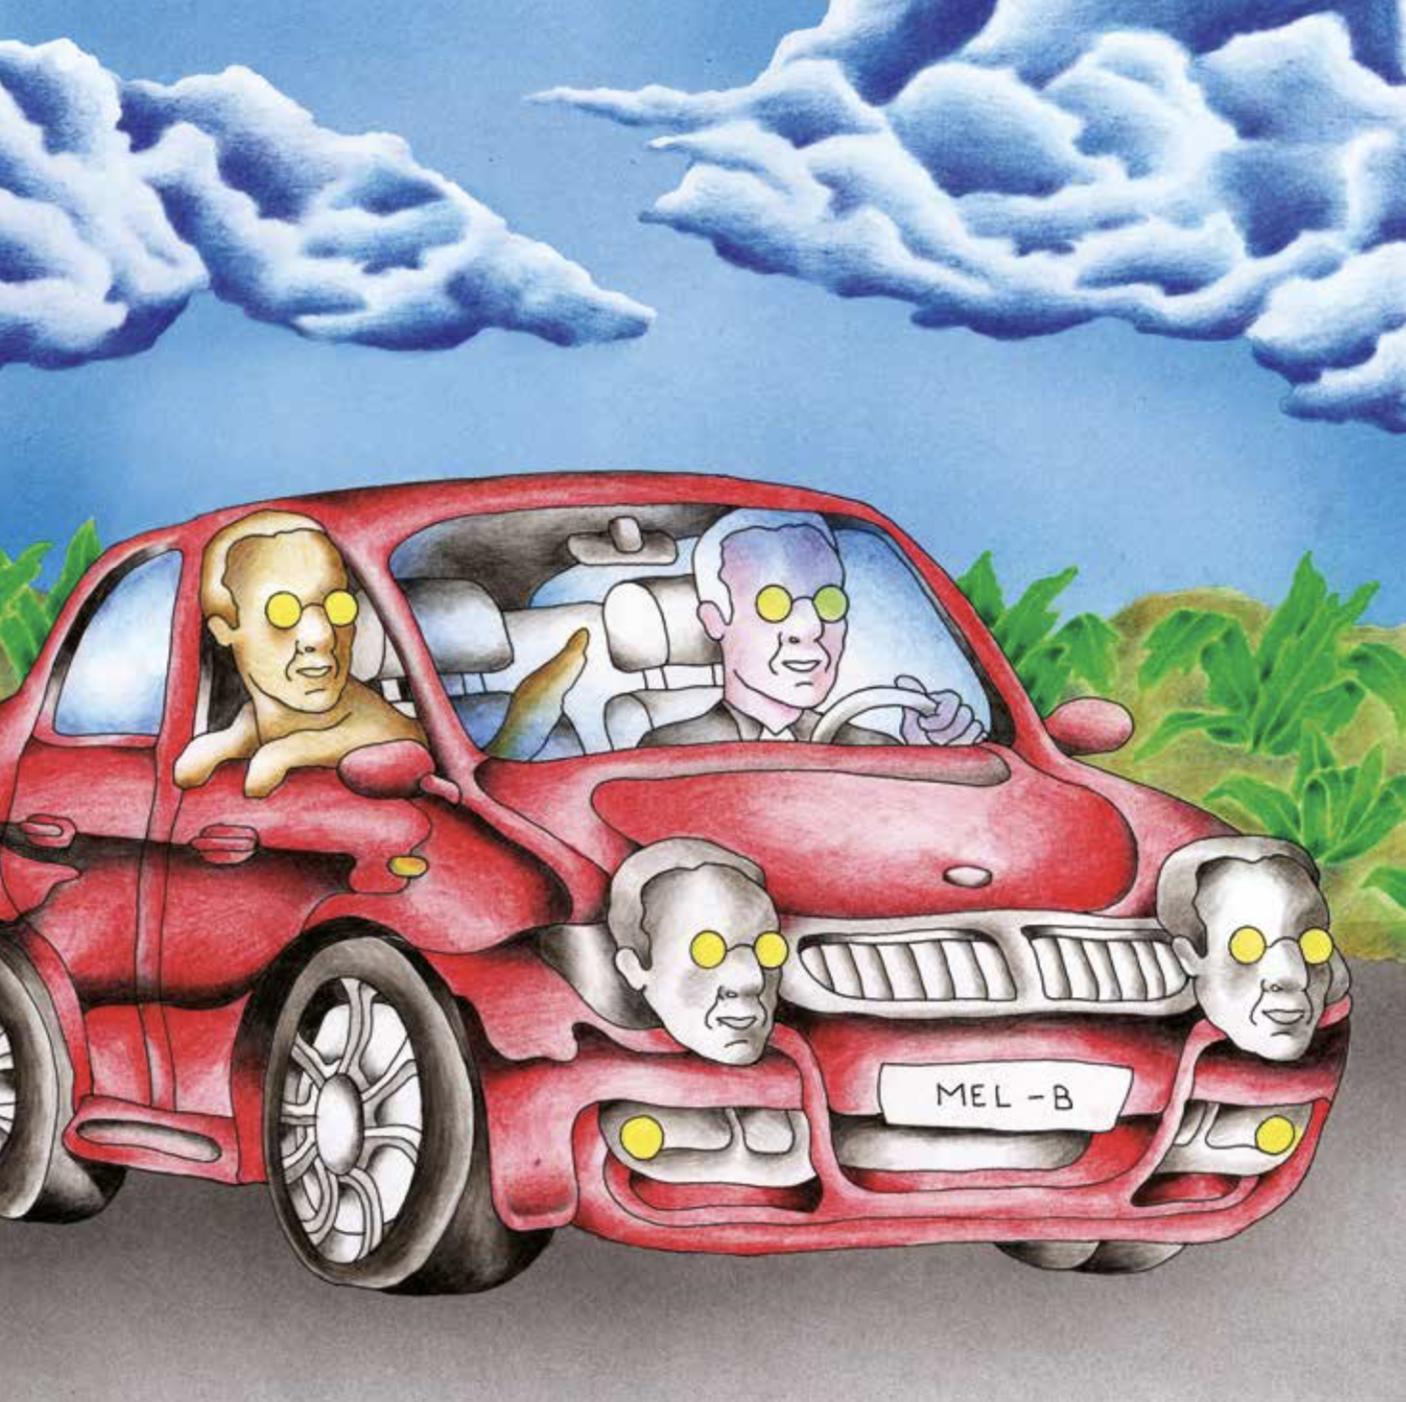 Illustration by Félix Decombat